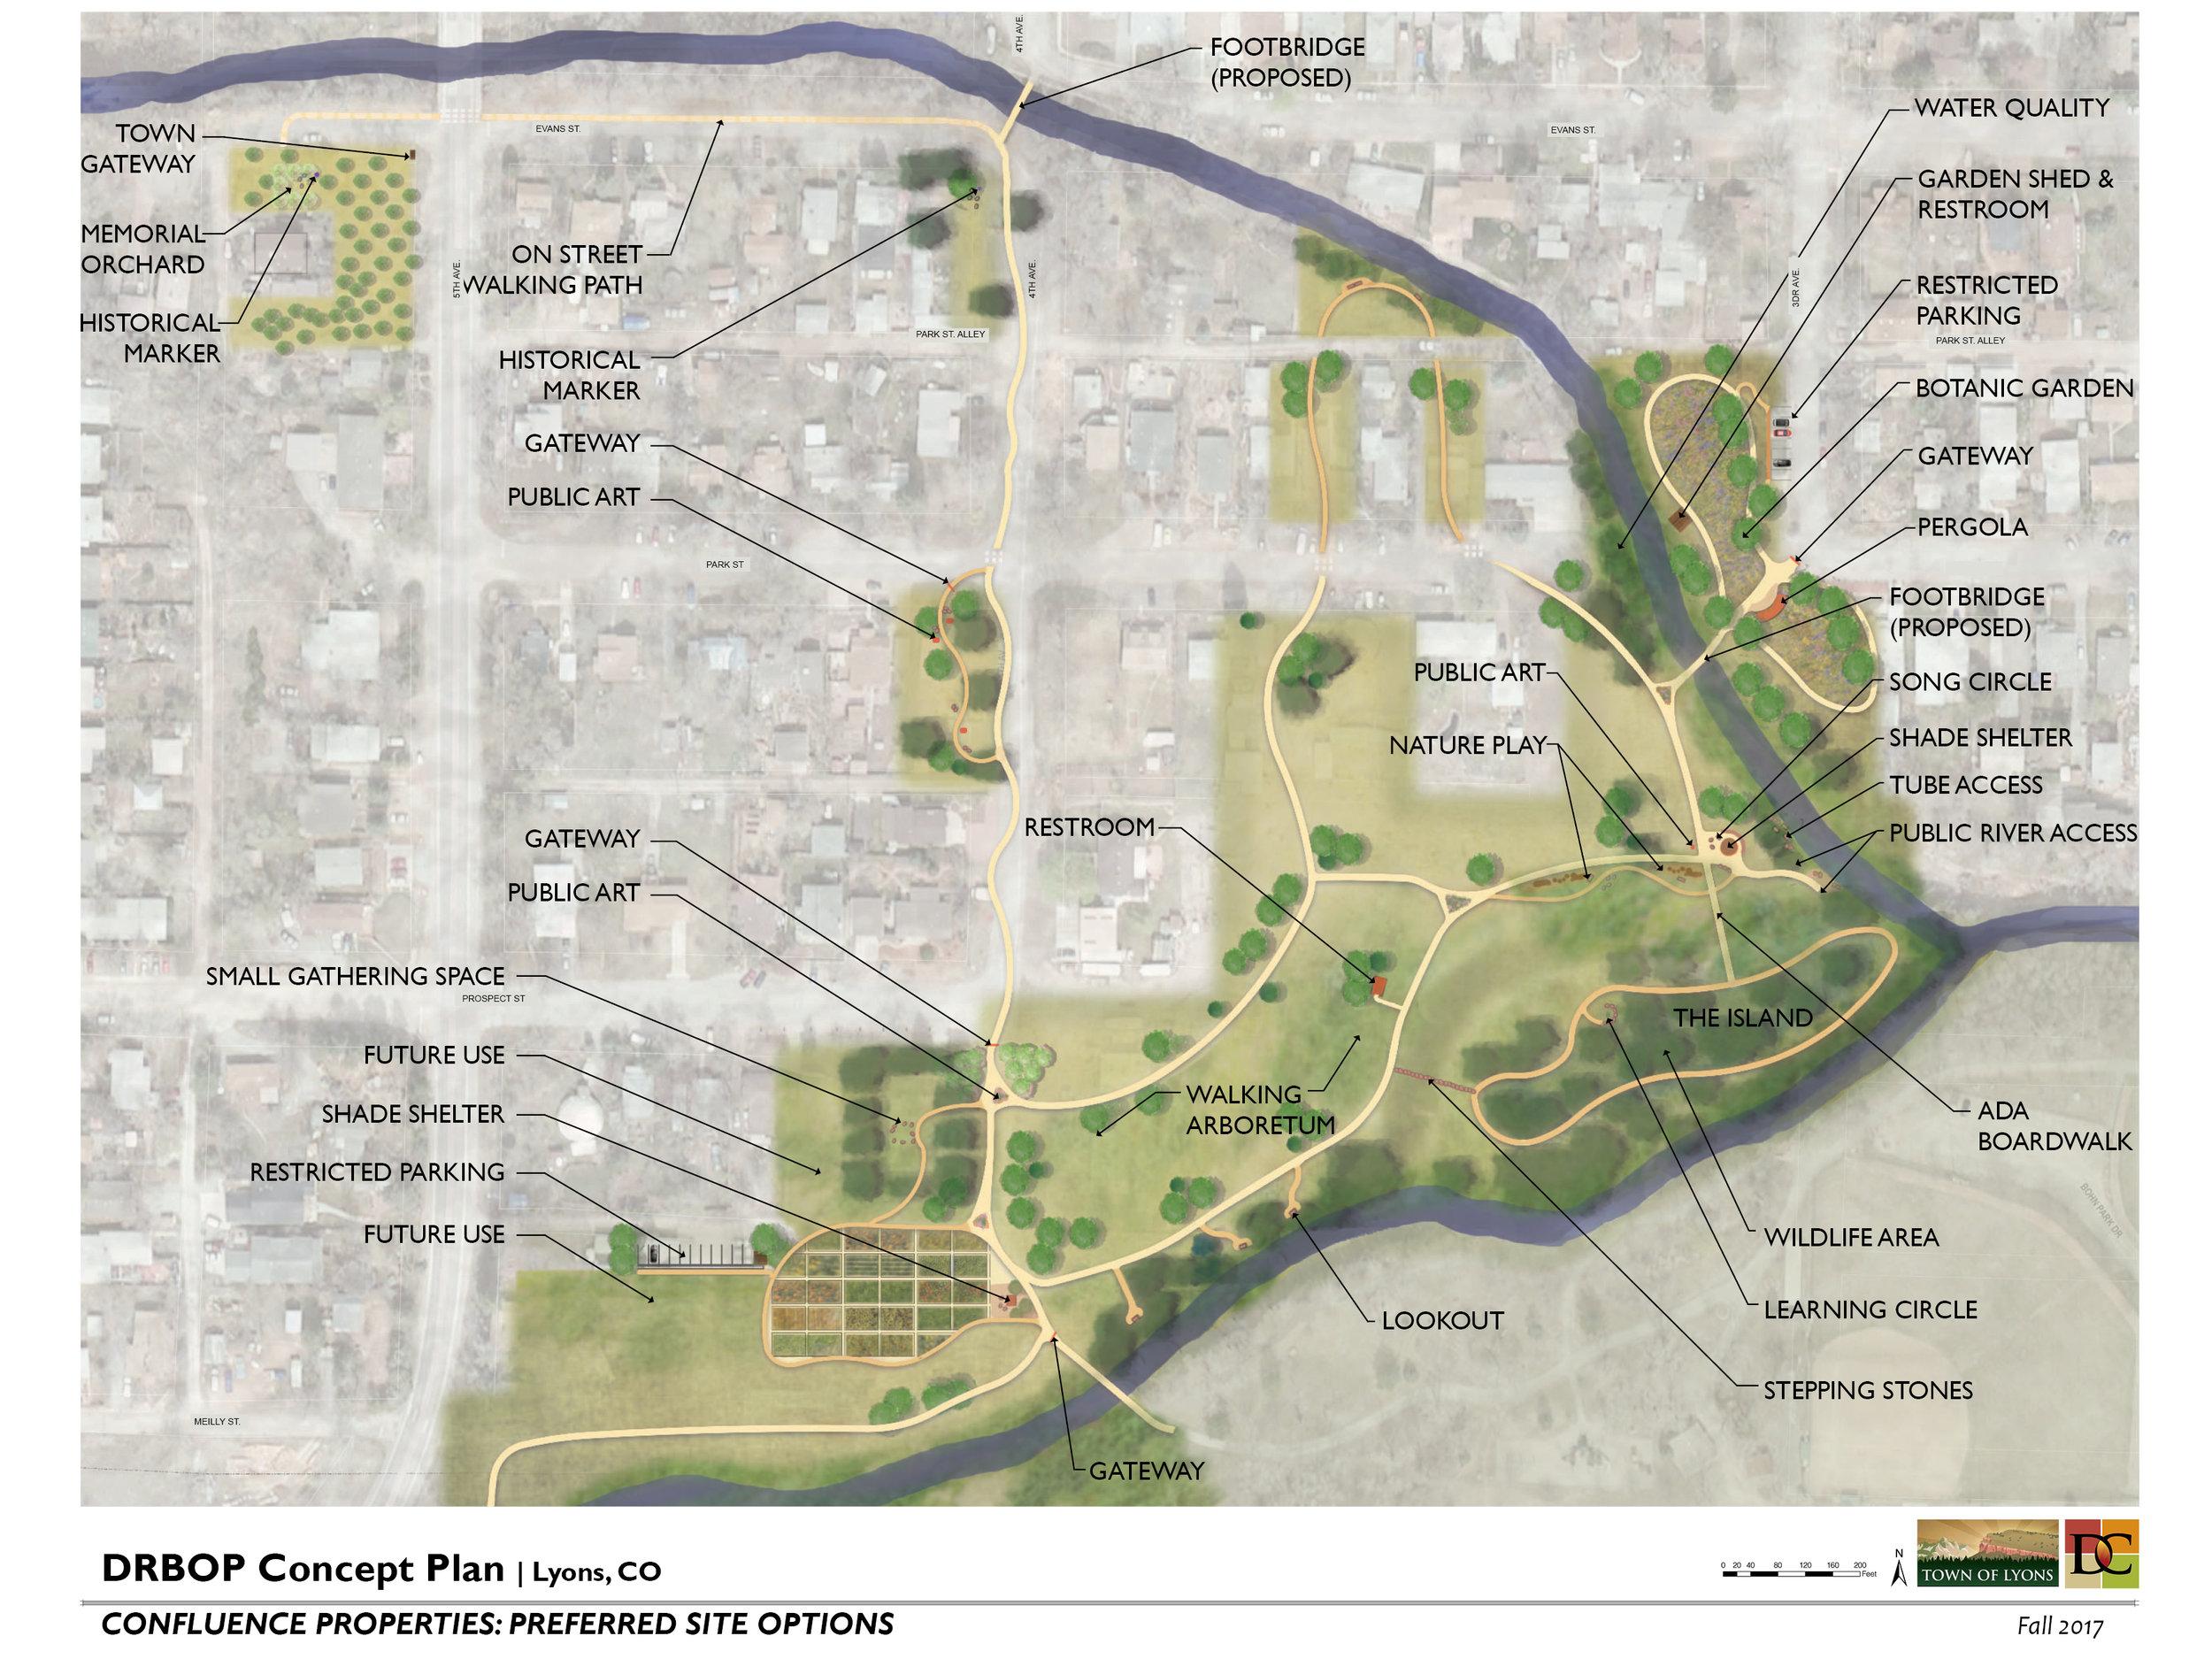 Land Use & Management Plan - Lyons, CO